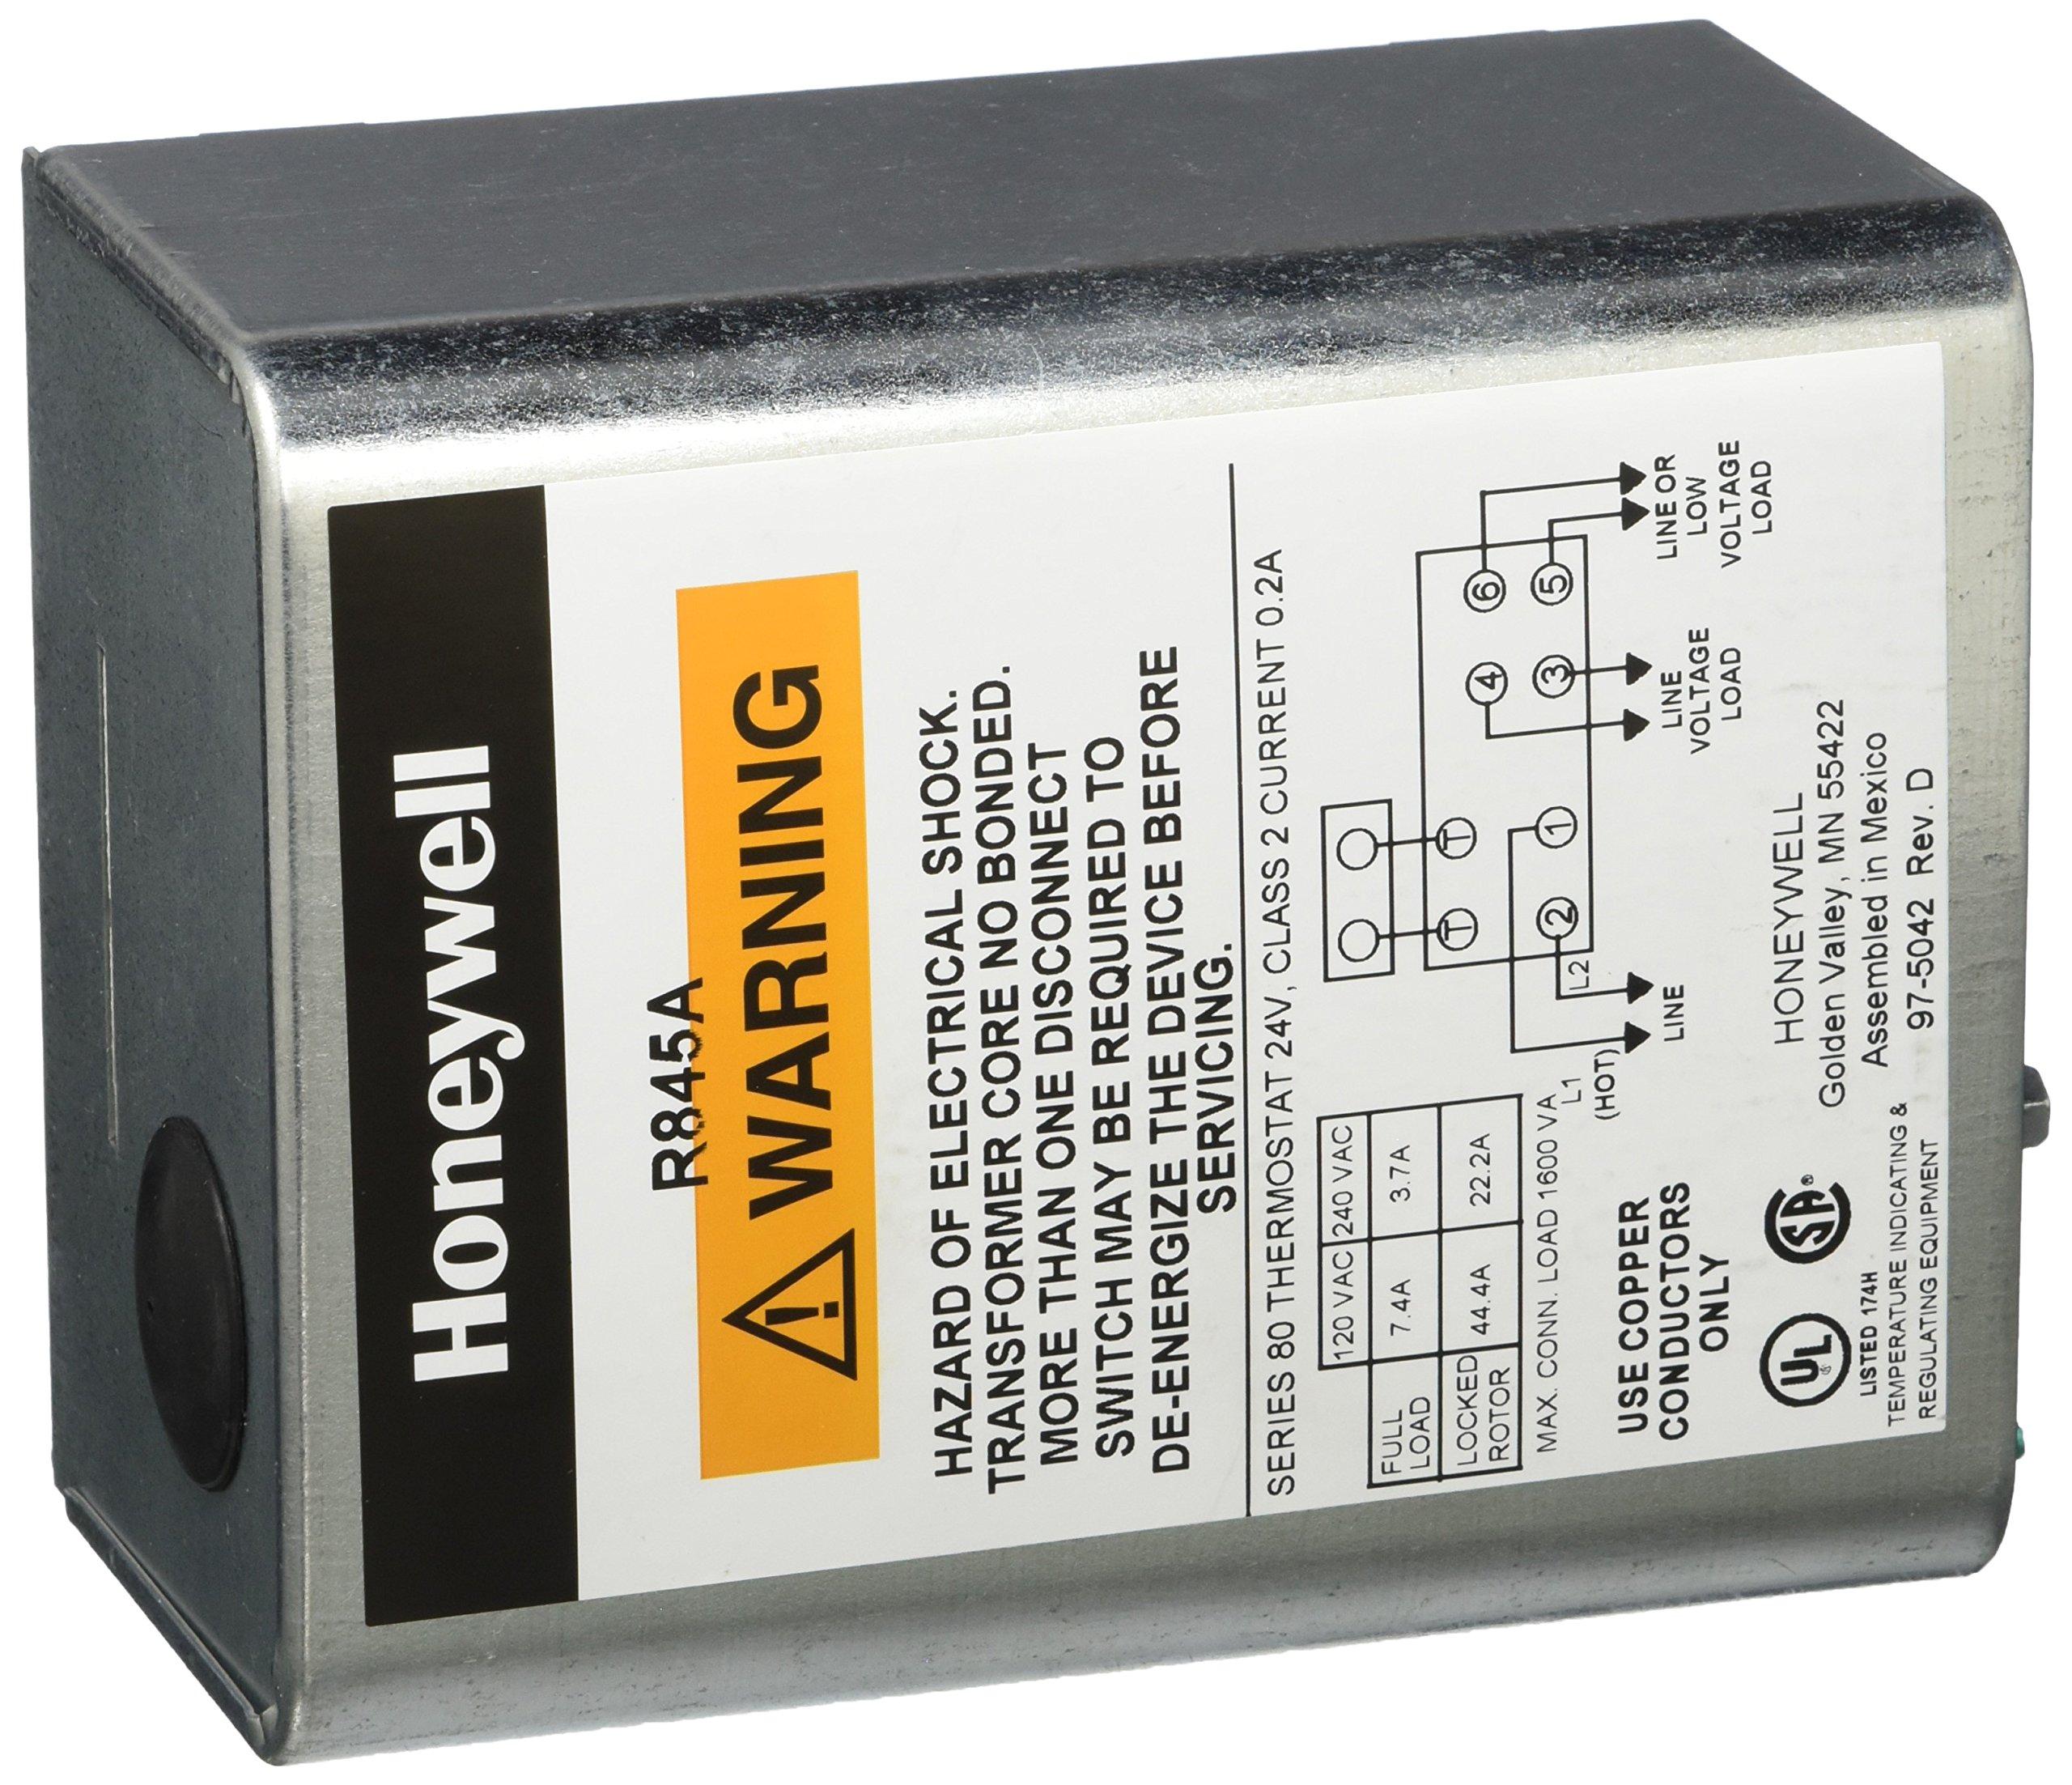 Honeywell R845A1030 Honeywell Switching Relay